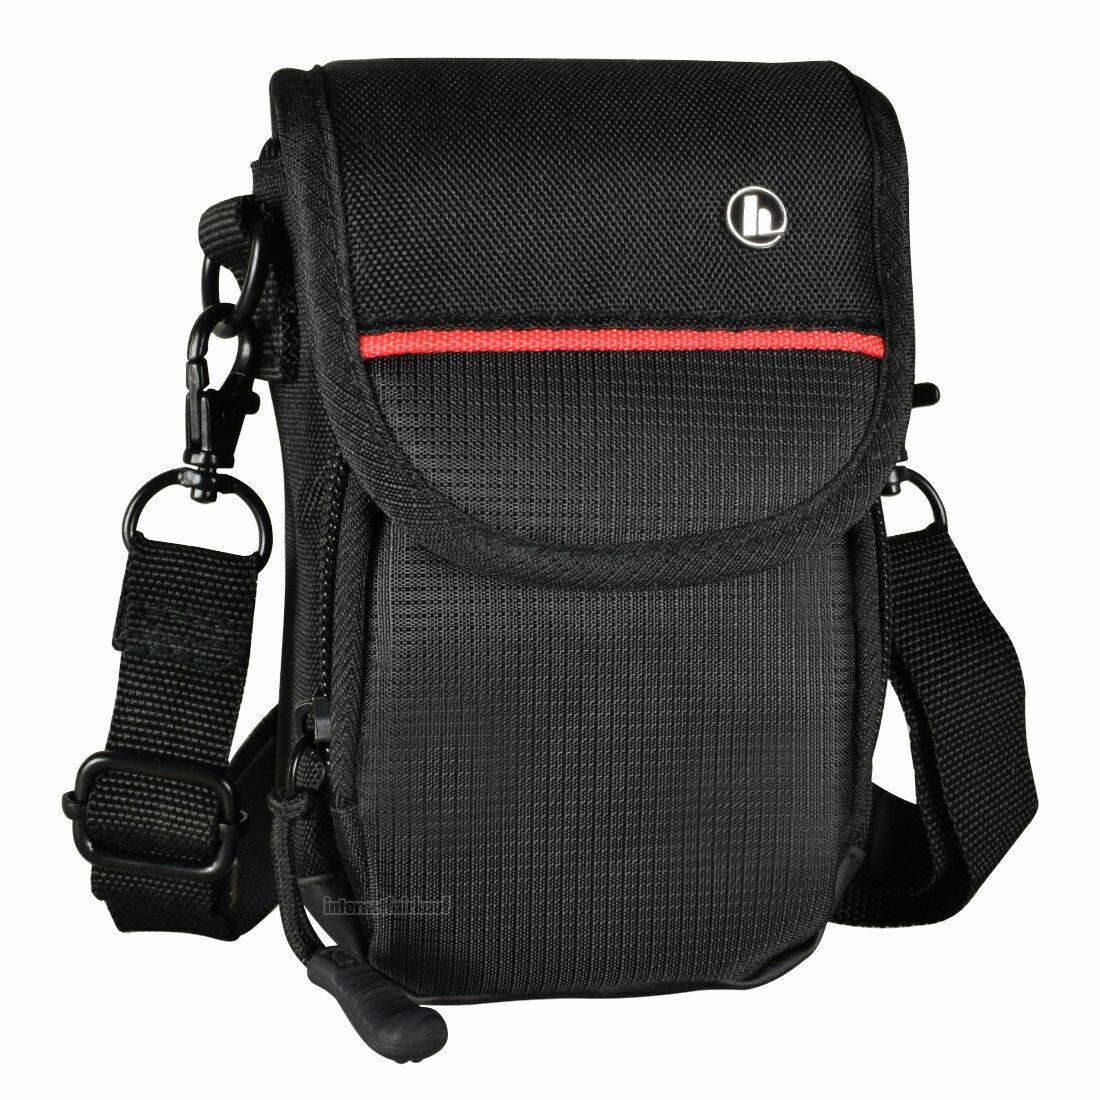 Hama Fototasche Tasche perfekt für Sony HDR-GW66 HDR-GW55